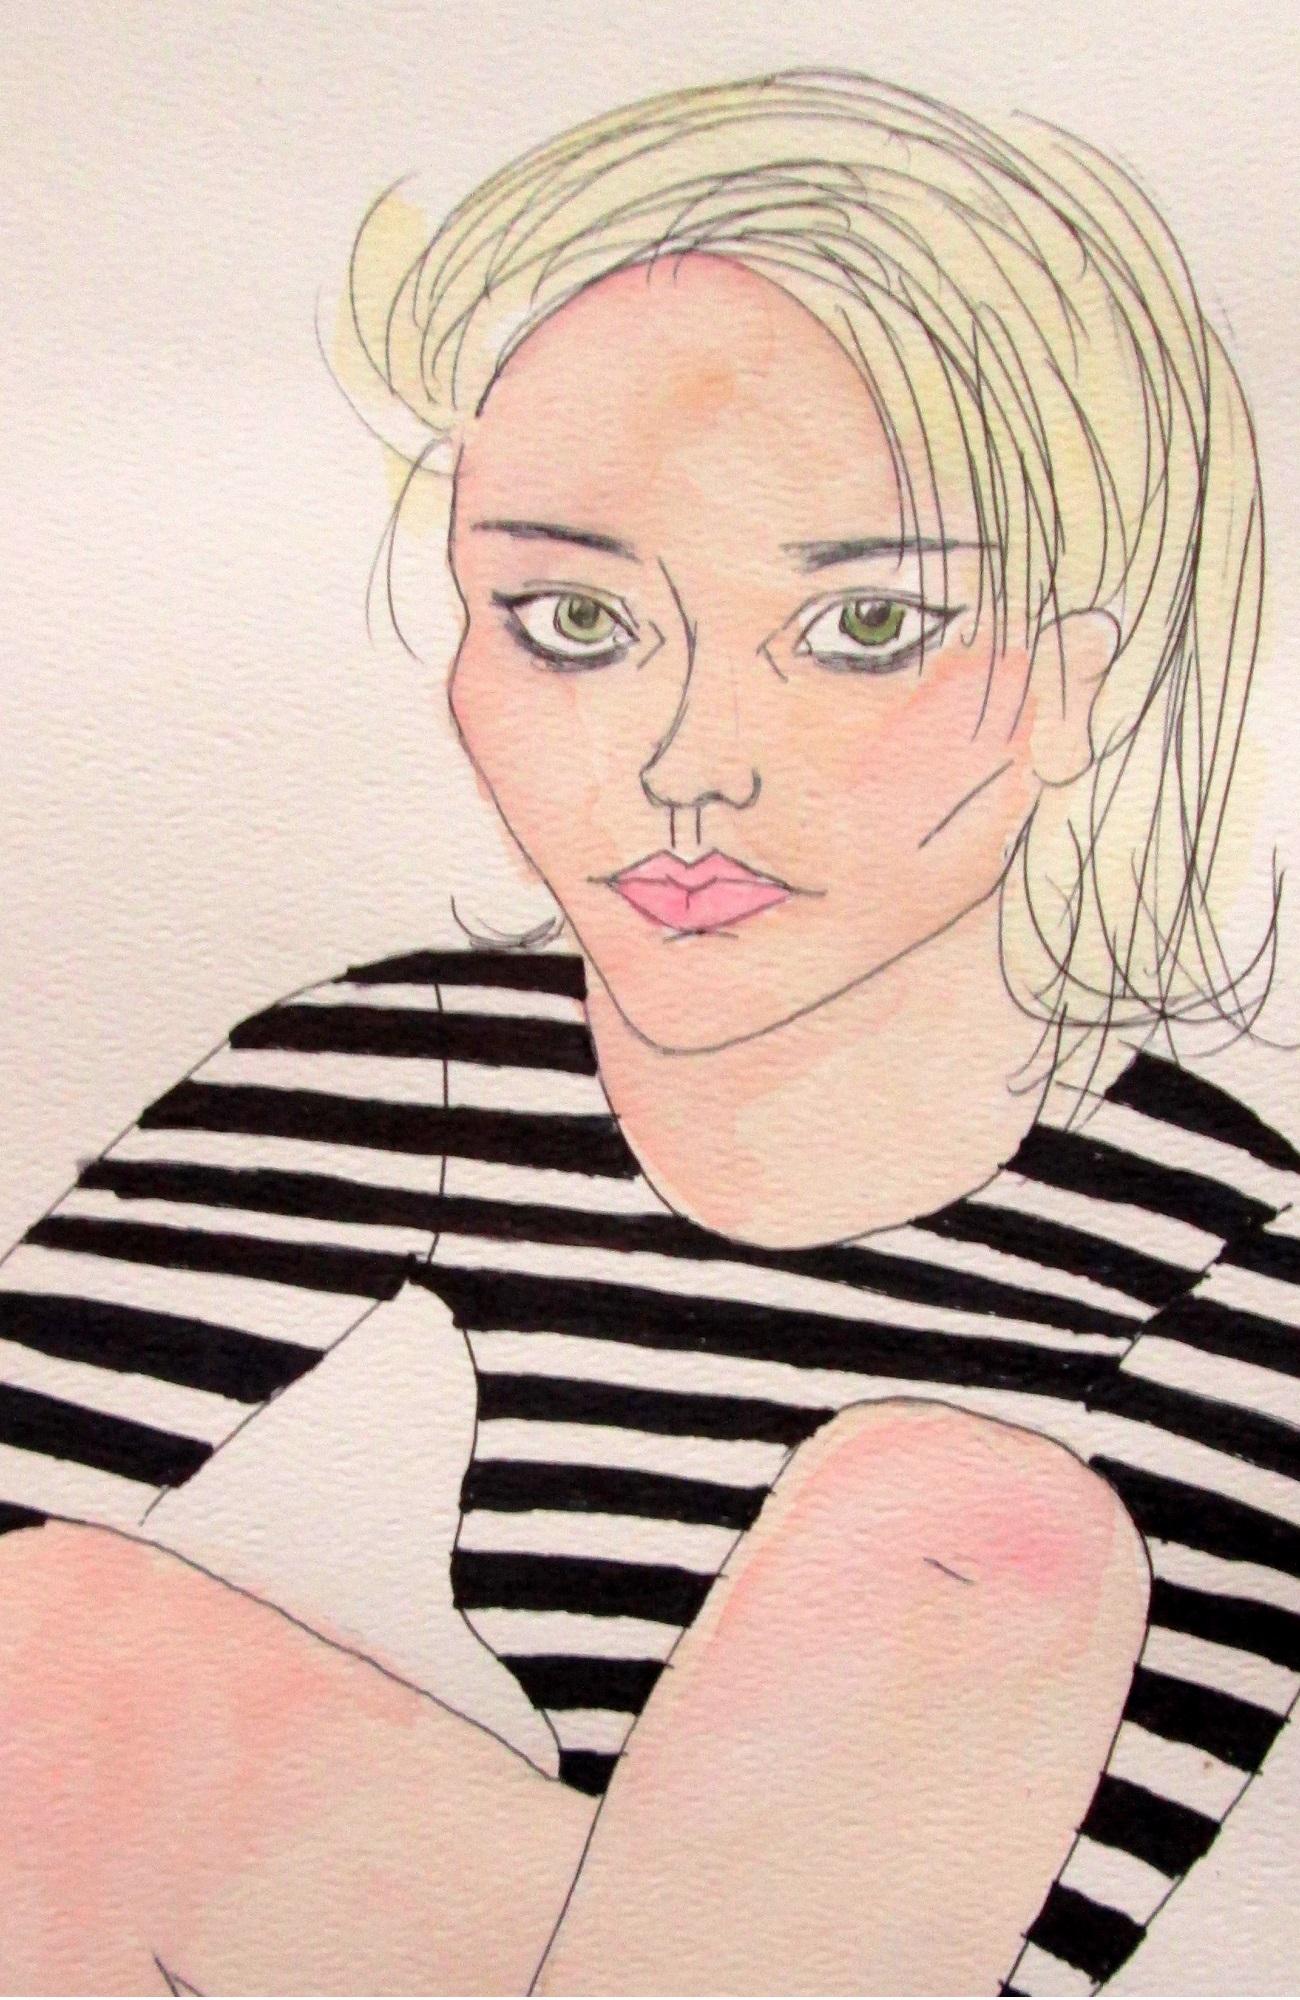 Sky Ferreira watercolor 2 on Storenvy